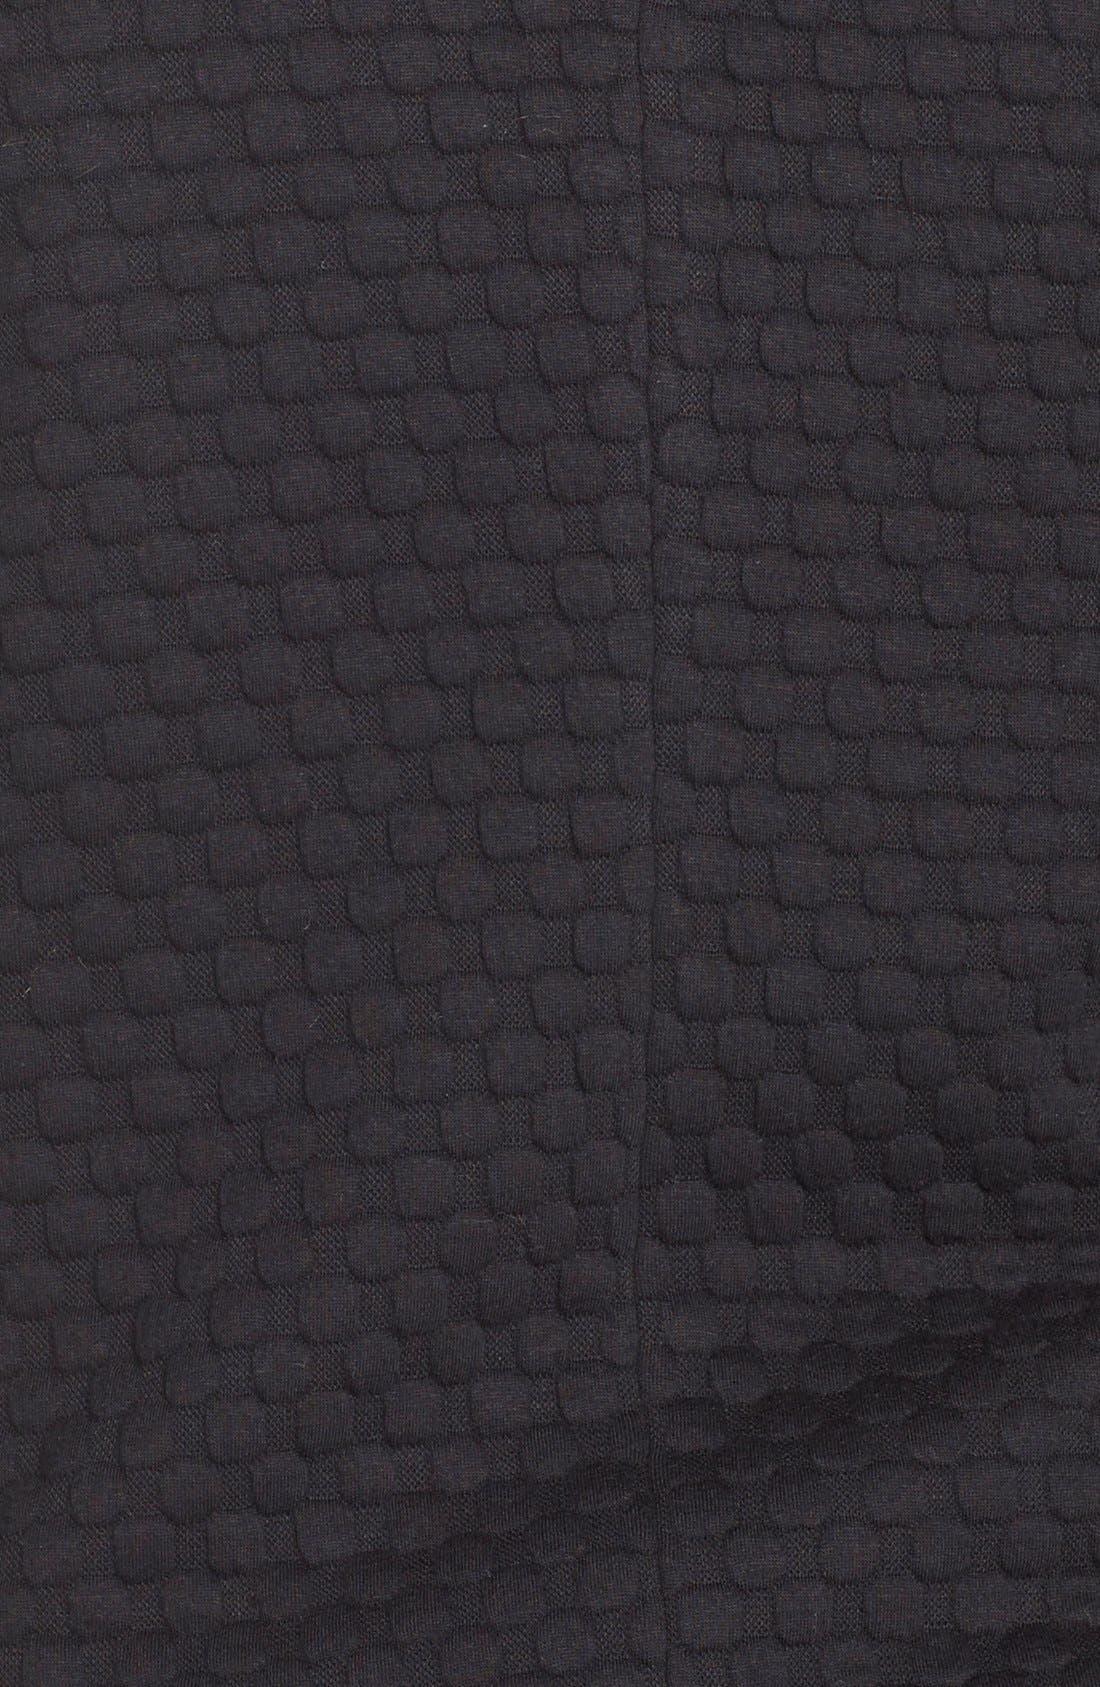 'Bridgette' Textured KnitJacket,                             Alternate thumbnail 3, color,                             001